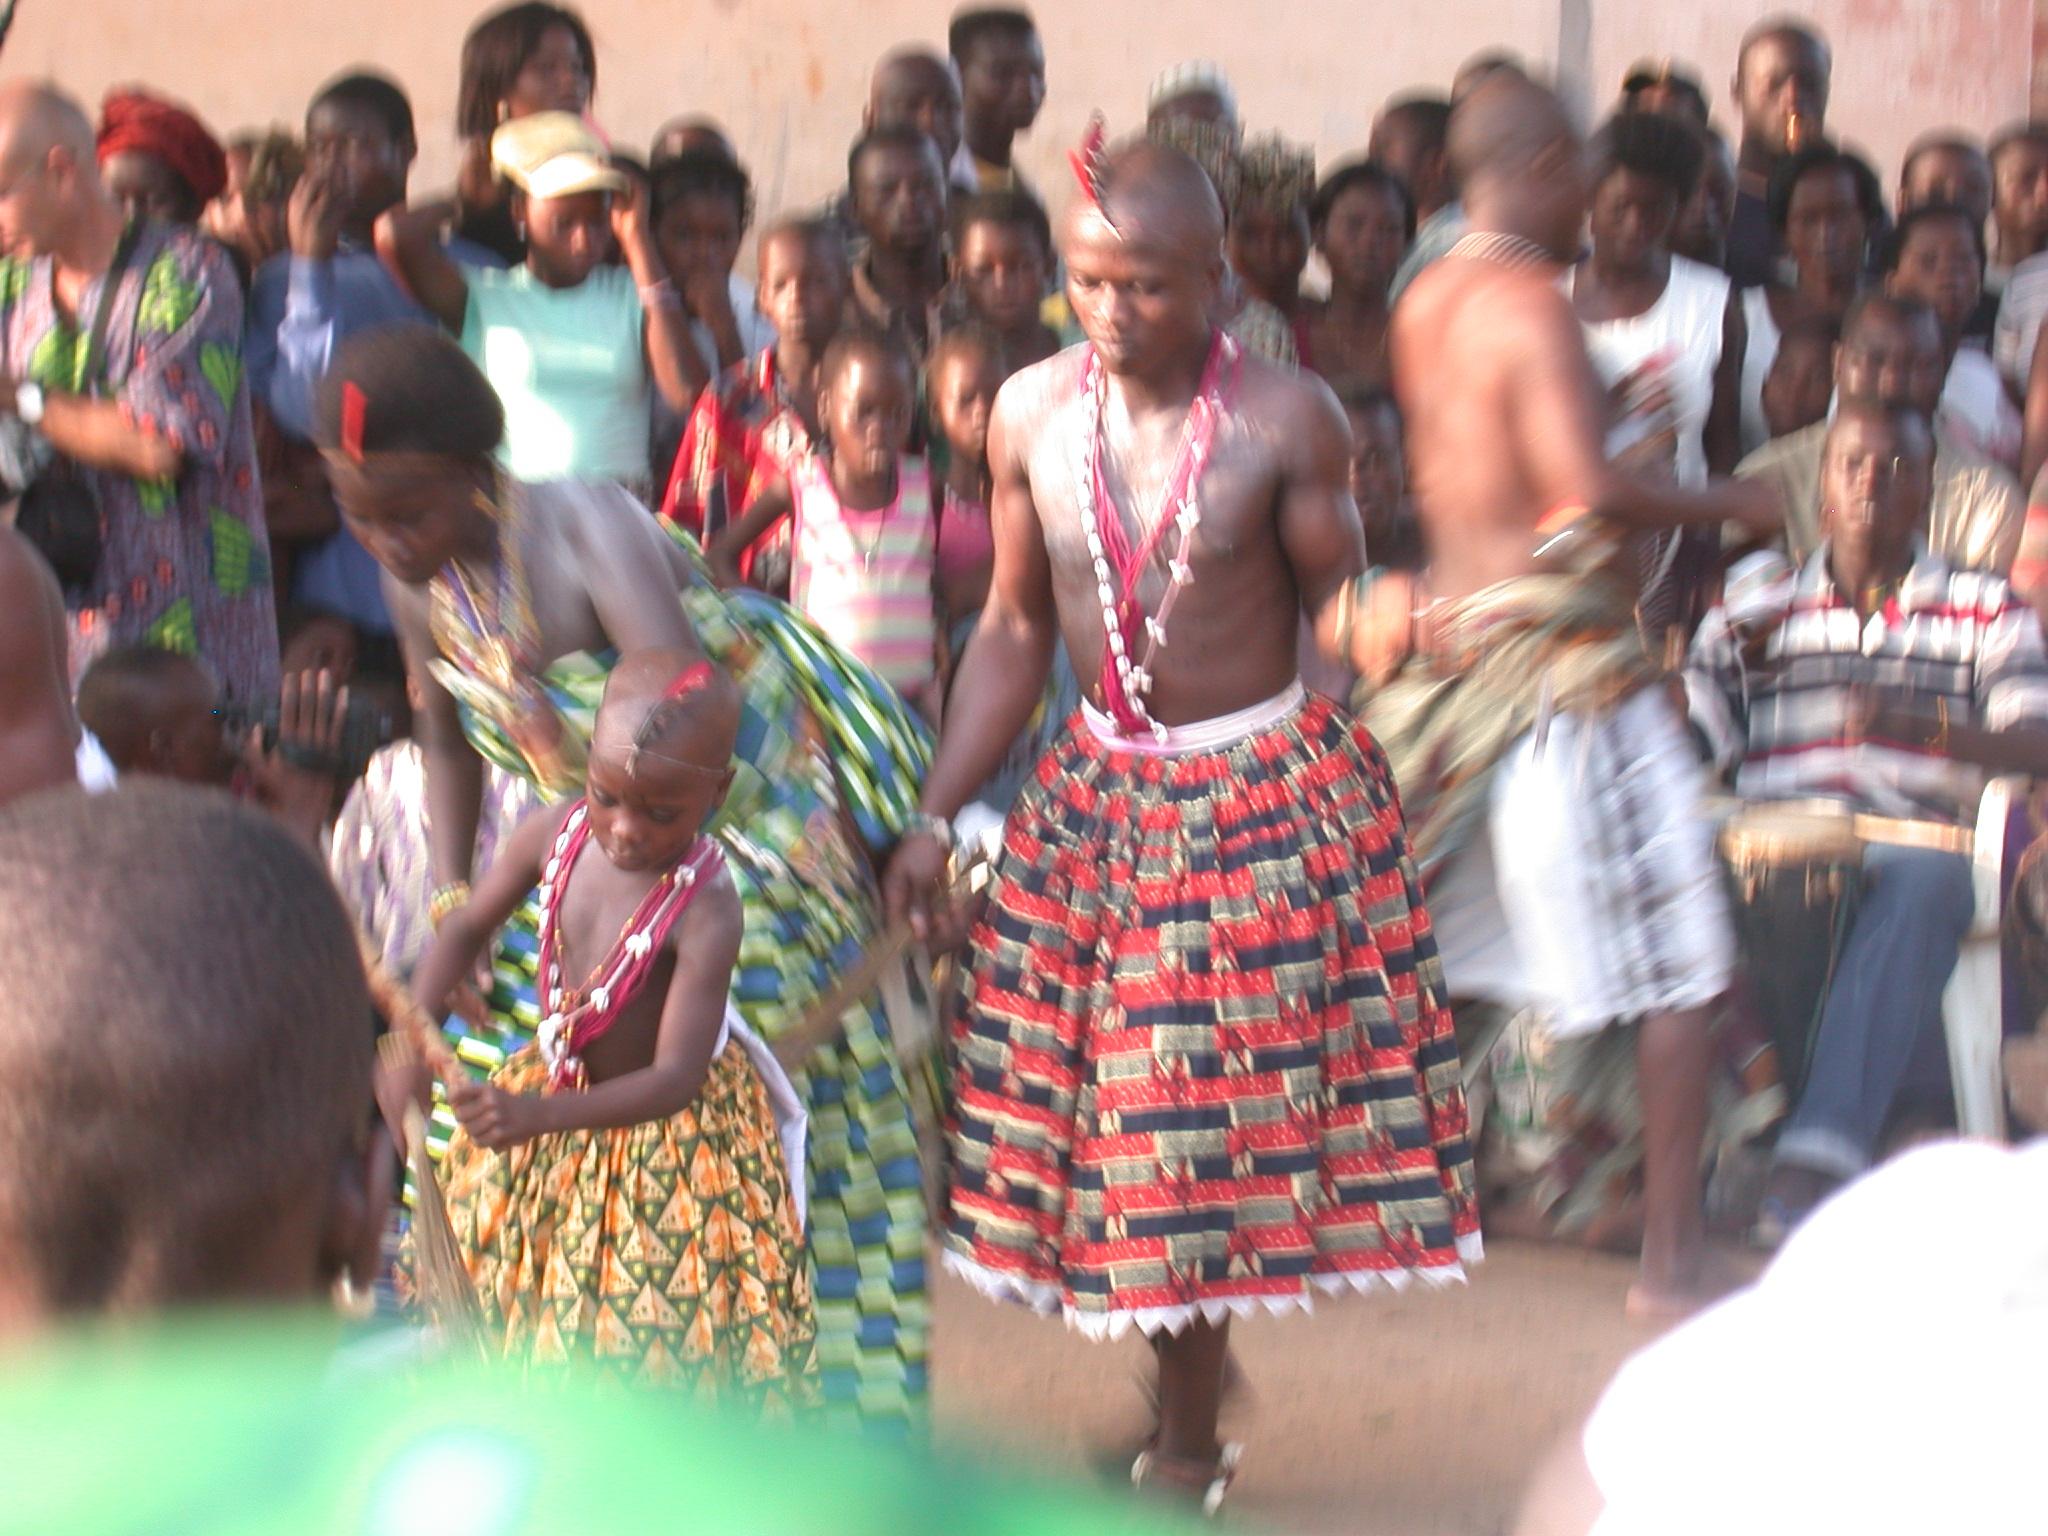 Devotees Continue Dancing, Vodun Ritual, Ouidah, Benin